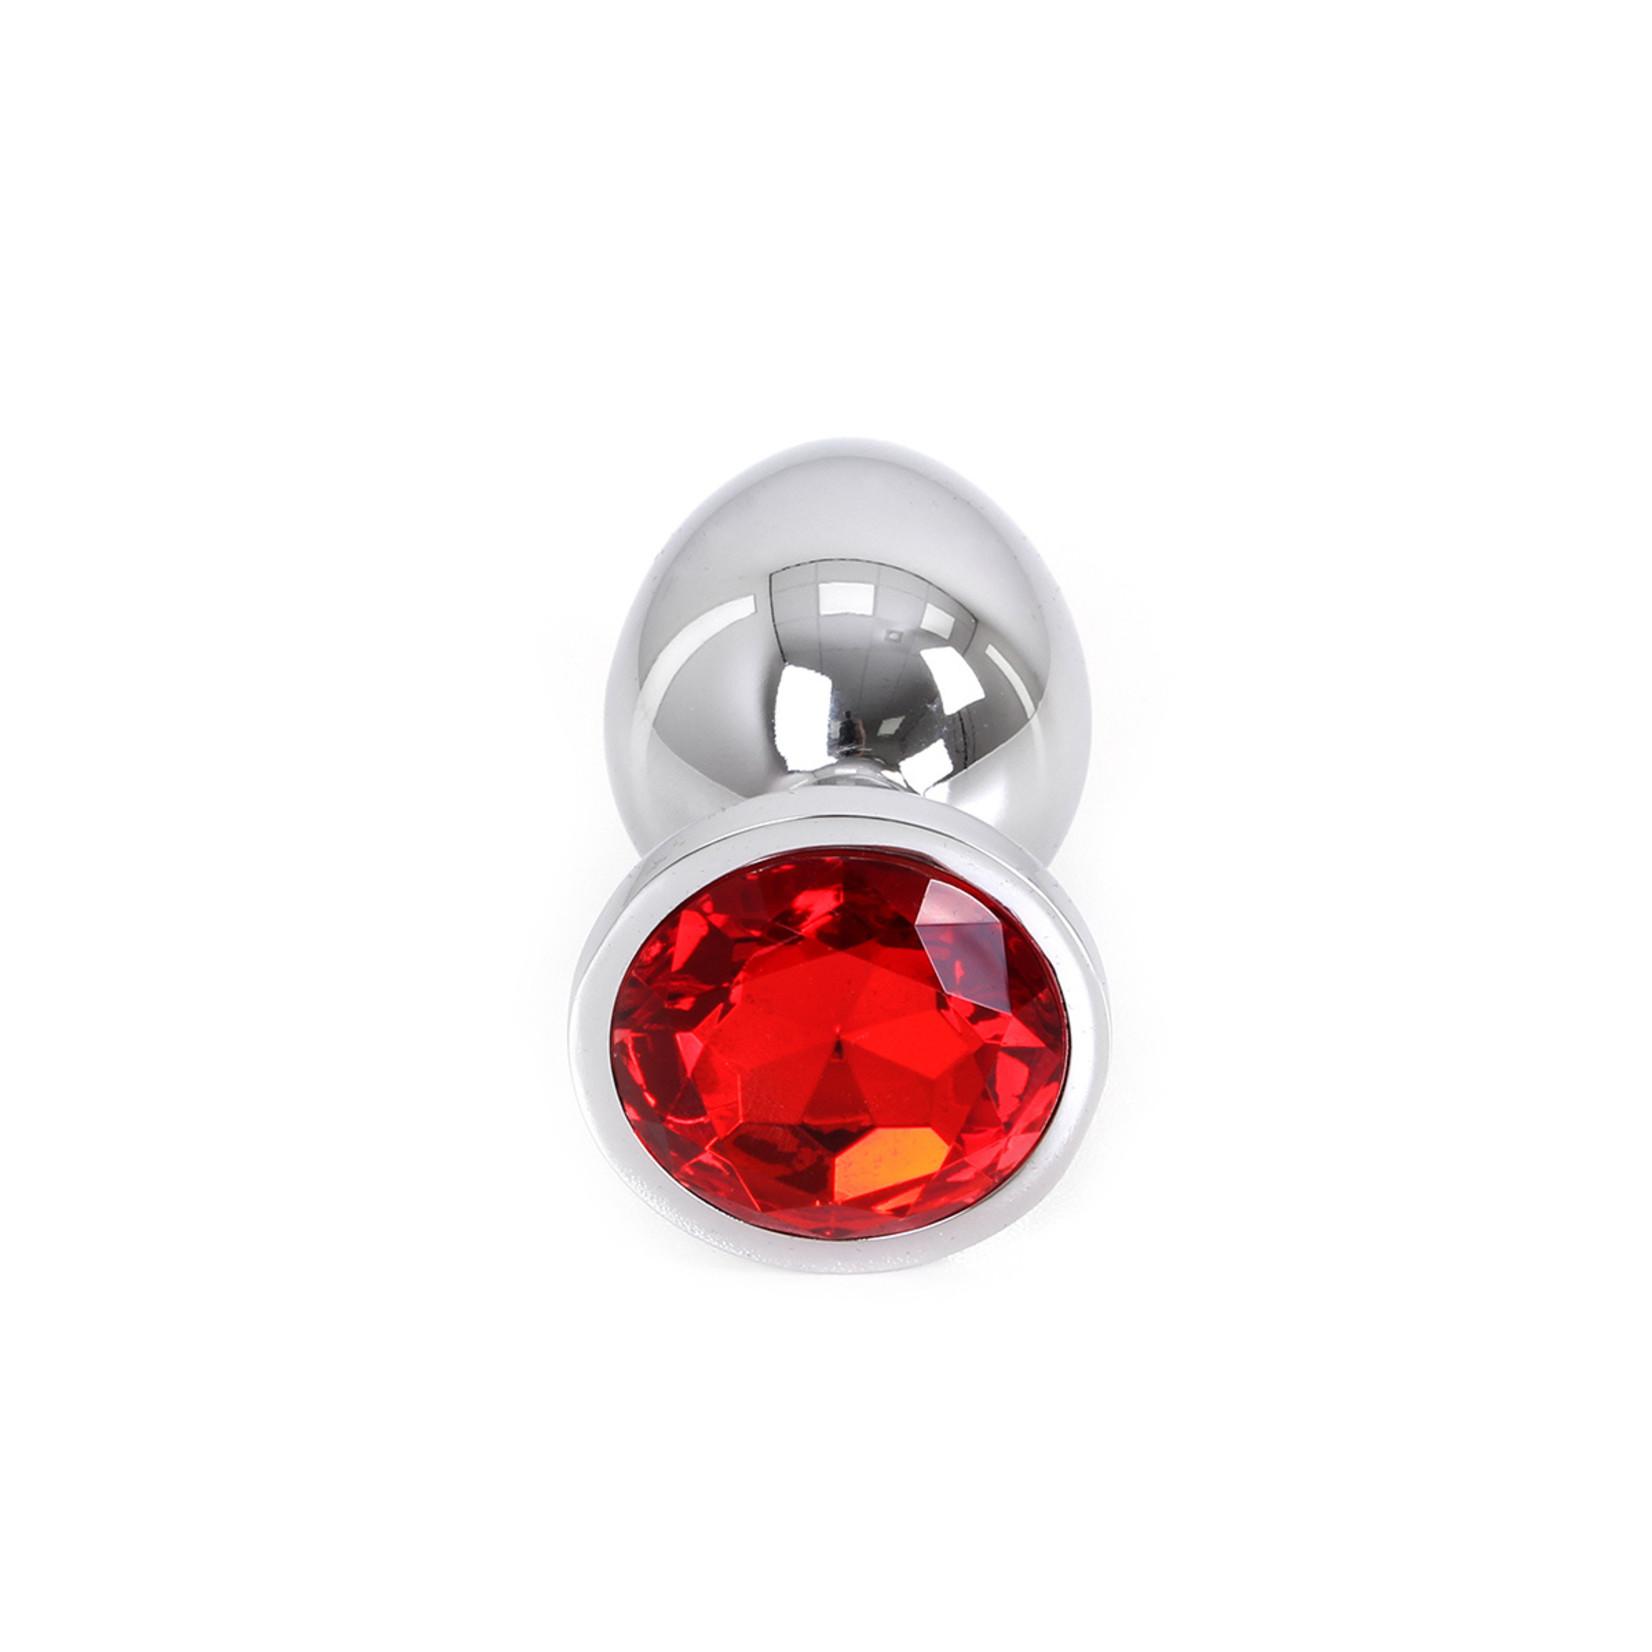 KIOTOS Butt plug Aluminium Large Red